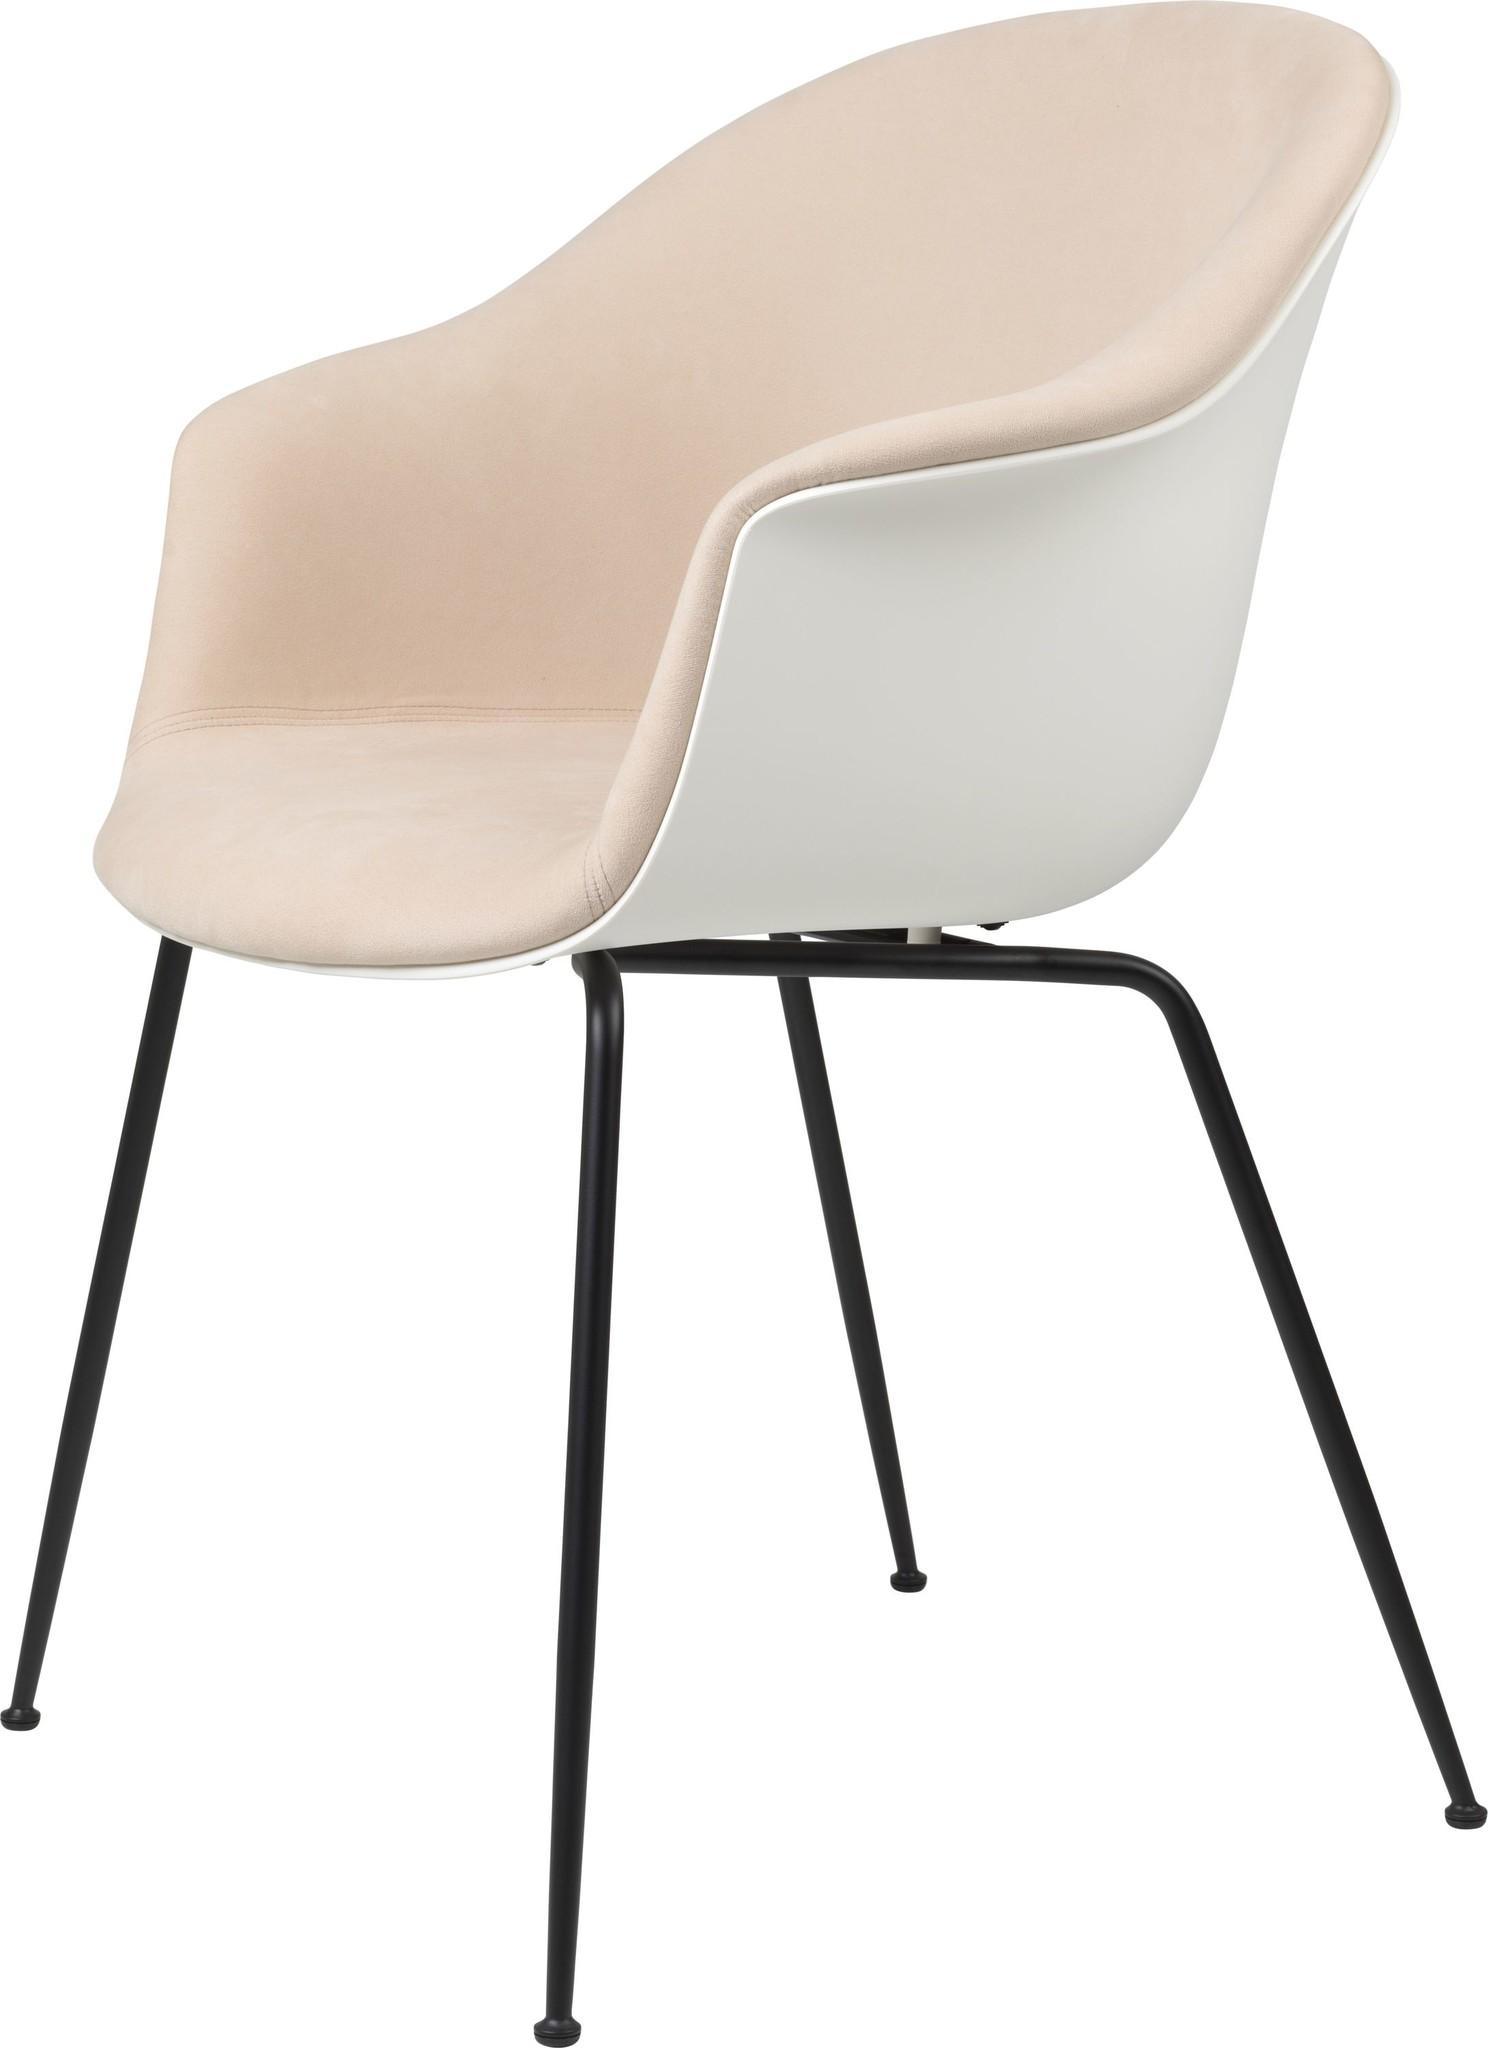 Bat Chair Half Gestoffeerd - Brass / Black - Vanaf € 619.00-1